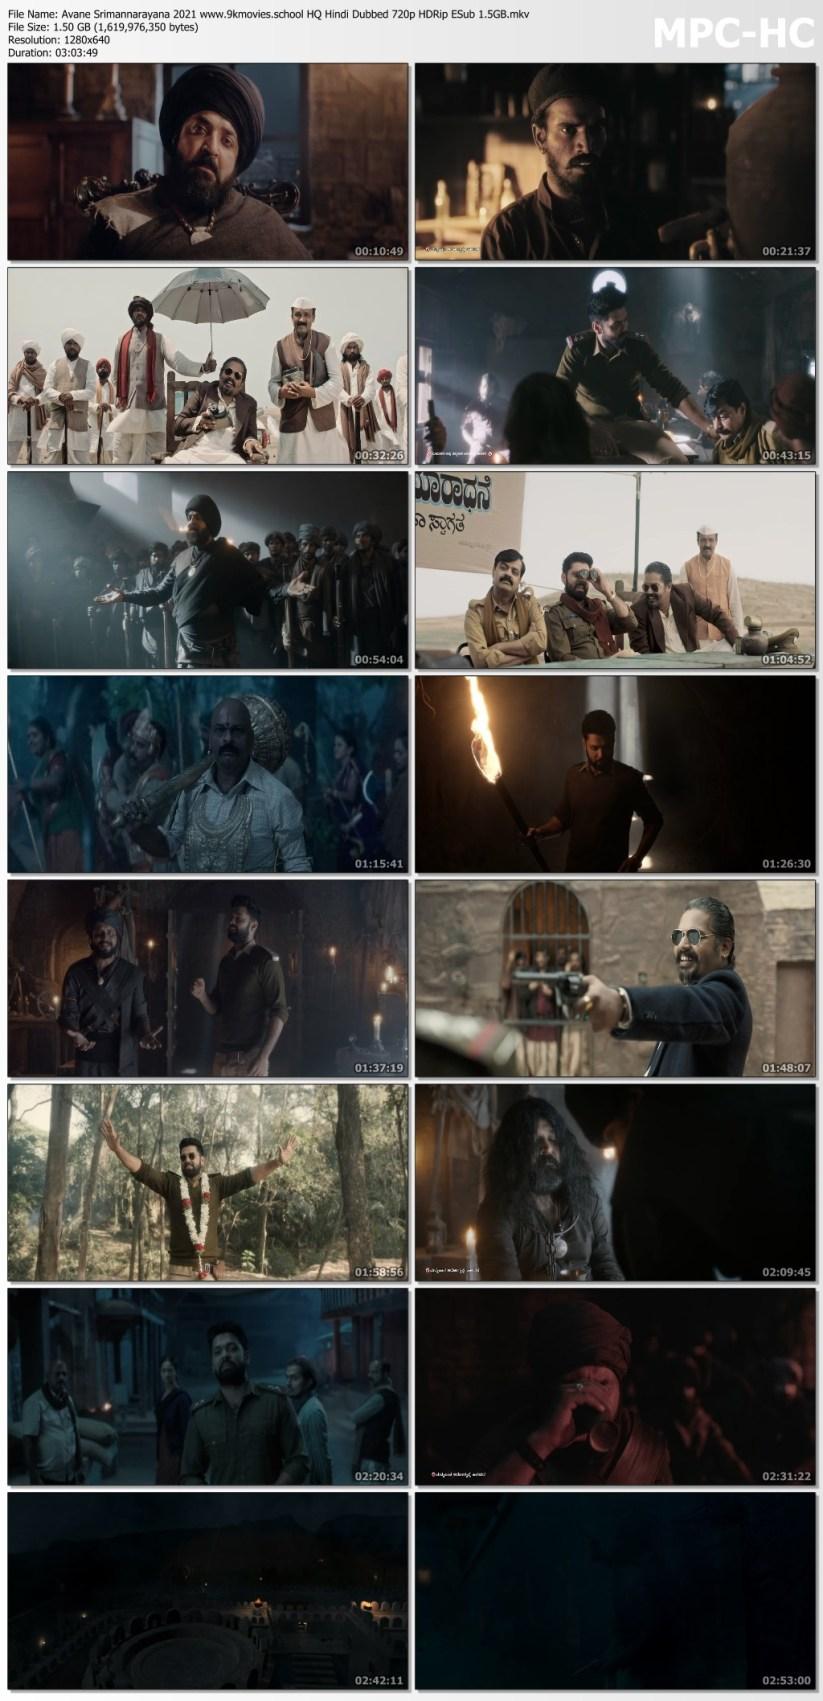 Download Avane Srimannarayana 2021 HQ Hindi Dubbed 720p HDRip ESub 1.5GB